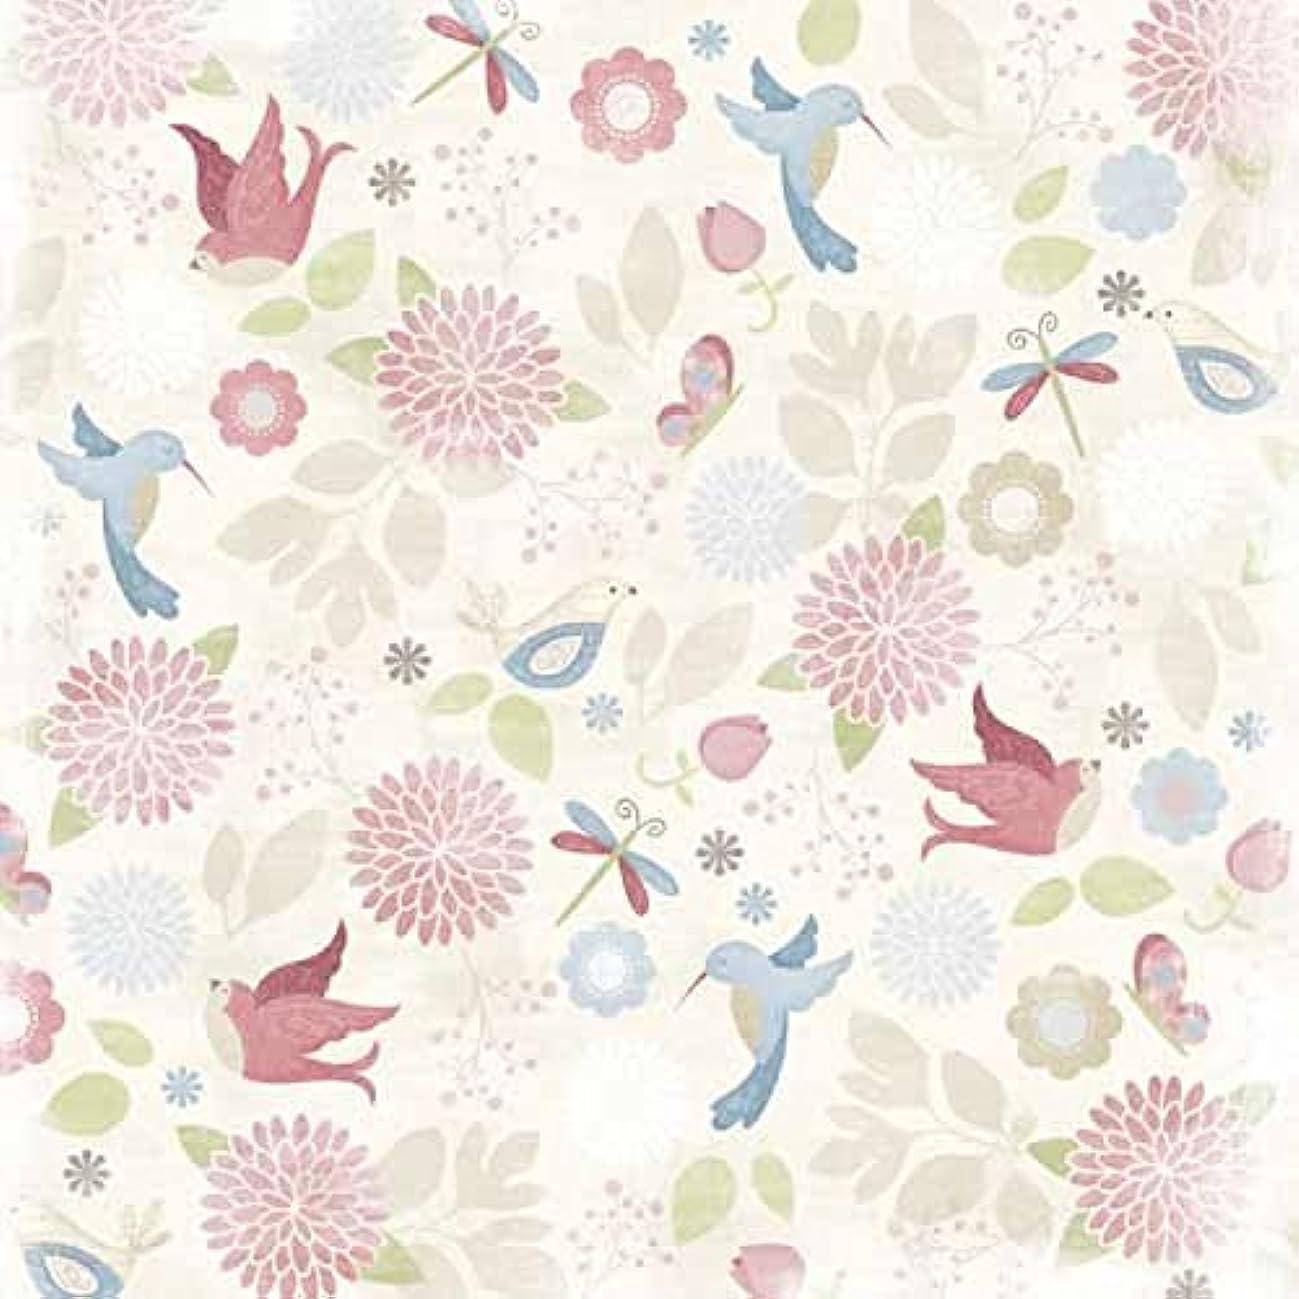 Karen Foster 64244 25 Sheets Birds and Blooms Scrapbooking Supplies